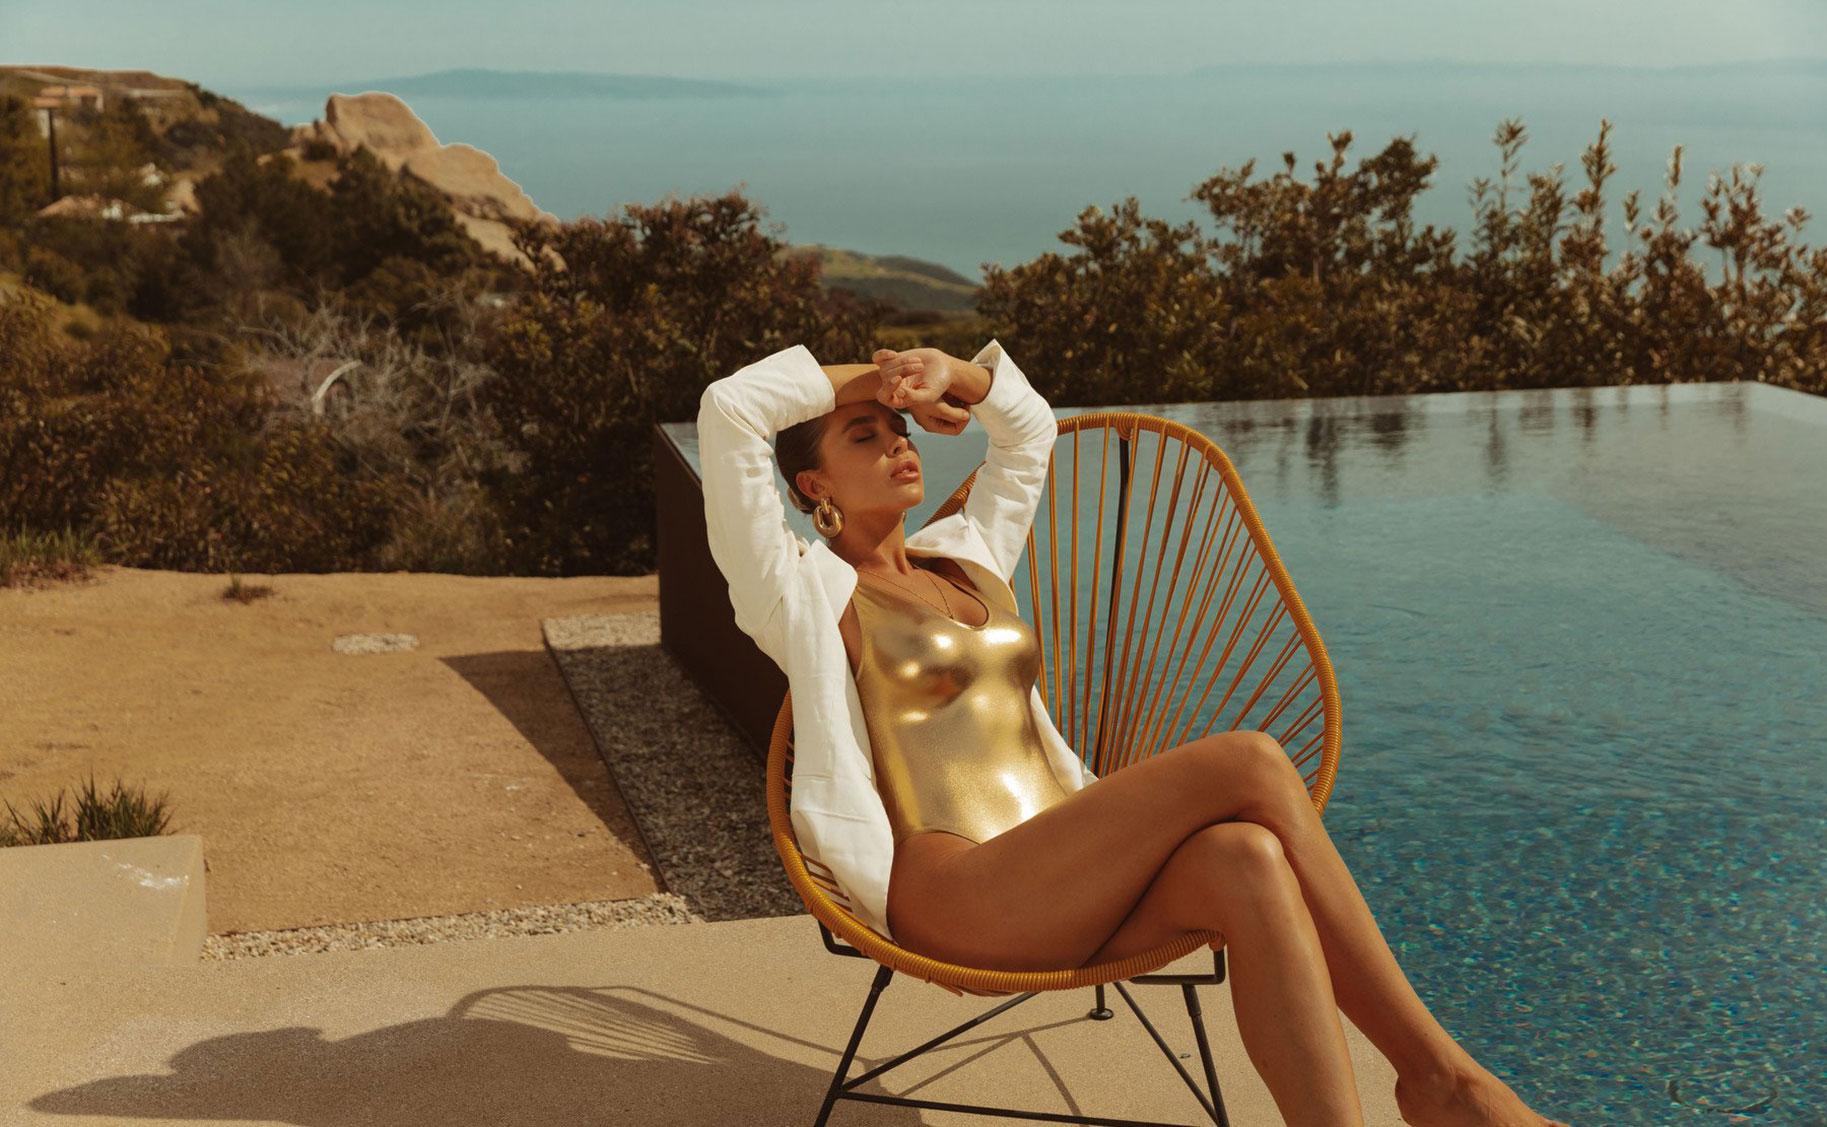 Мара Тиген в нижнем белье и купальниках модного бренда Gooseberry Intimates / фото 34